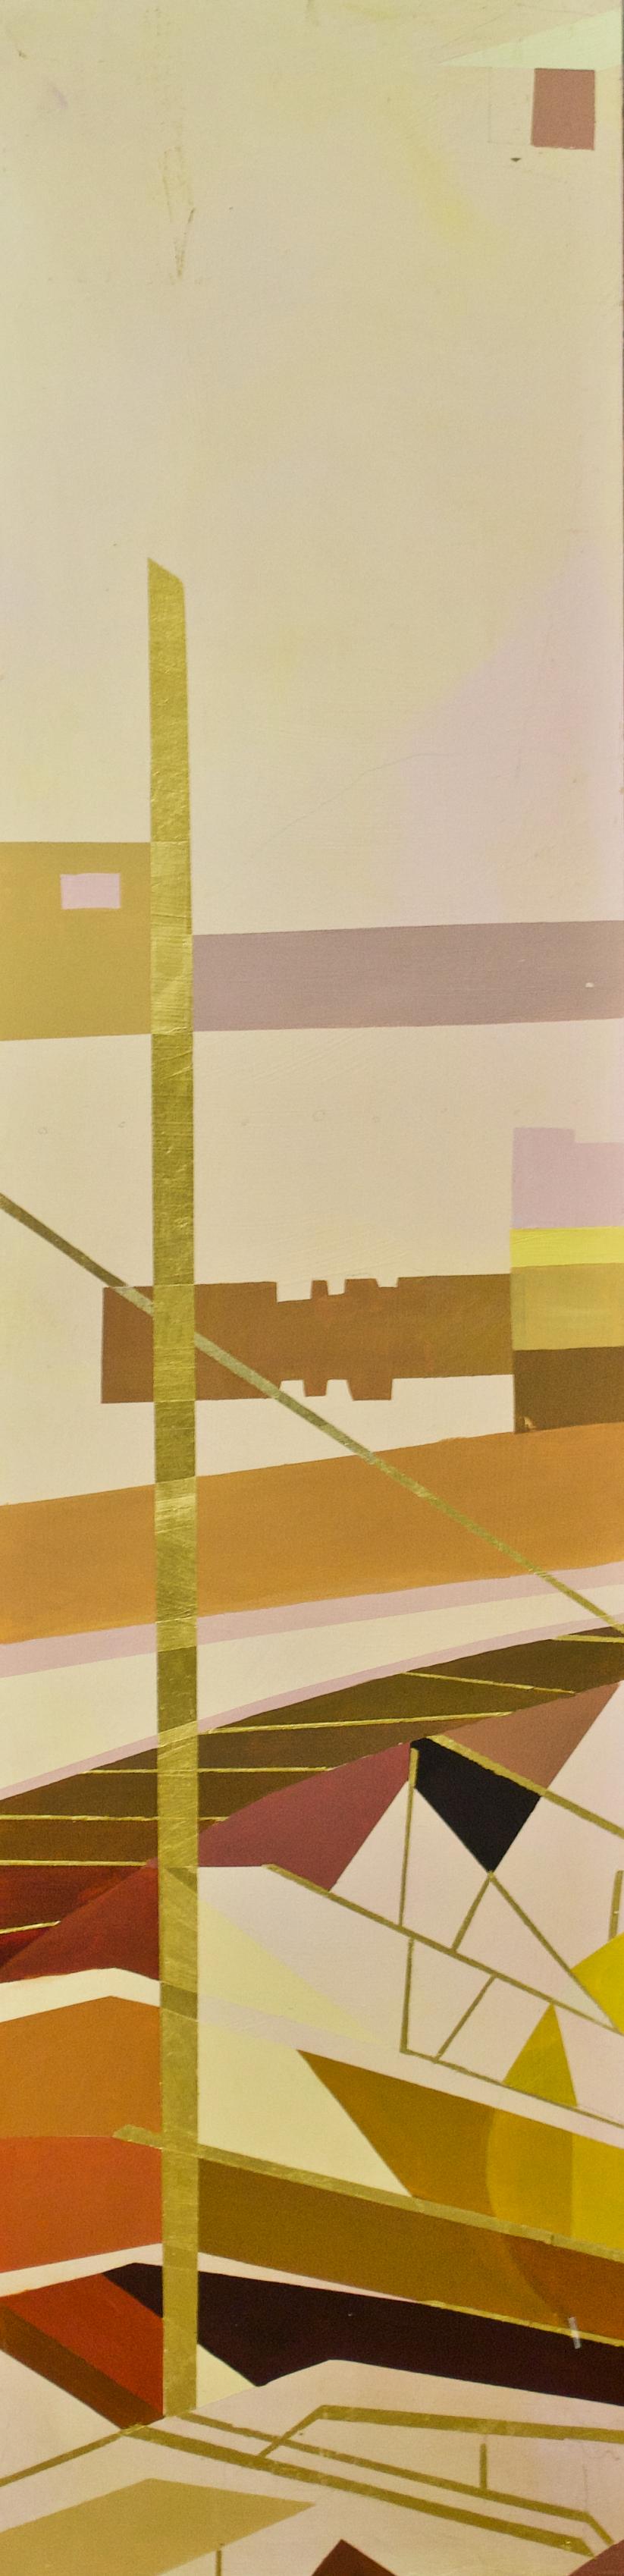 "Wonderwheel #35 - 40"" x 10"" oil and gold leaf on panel$1300"